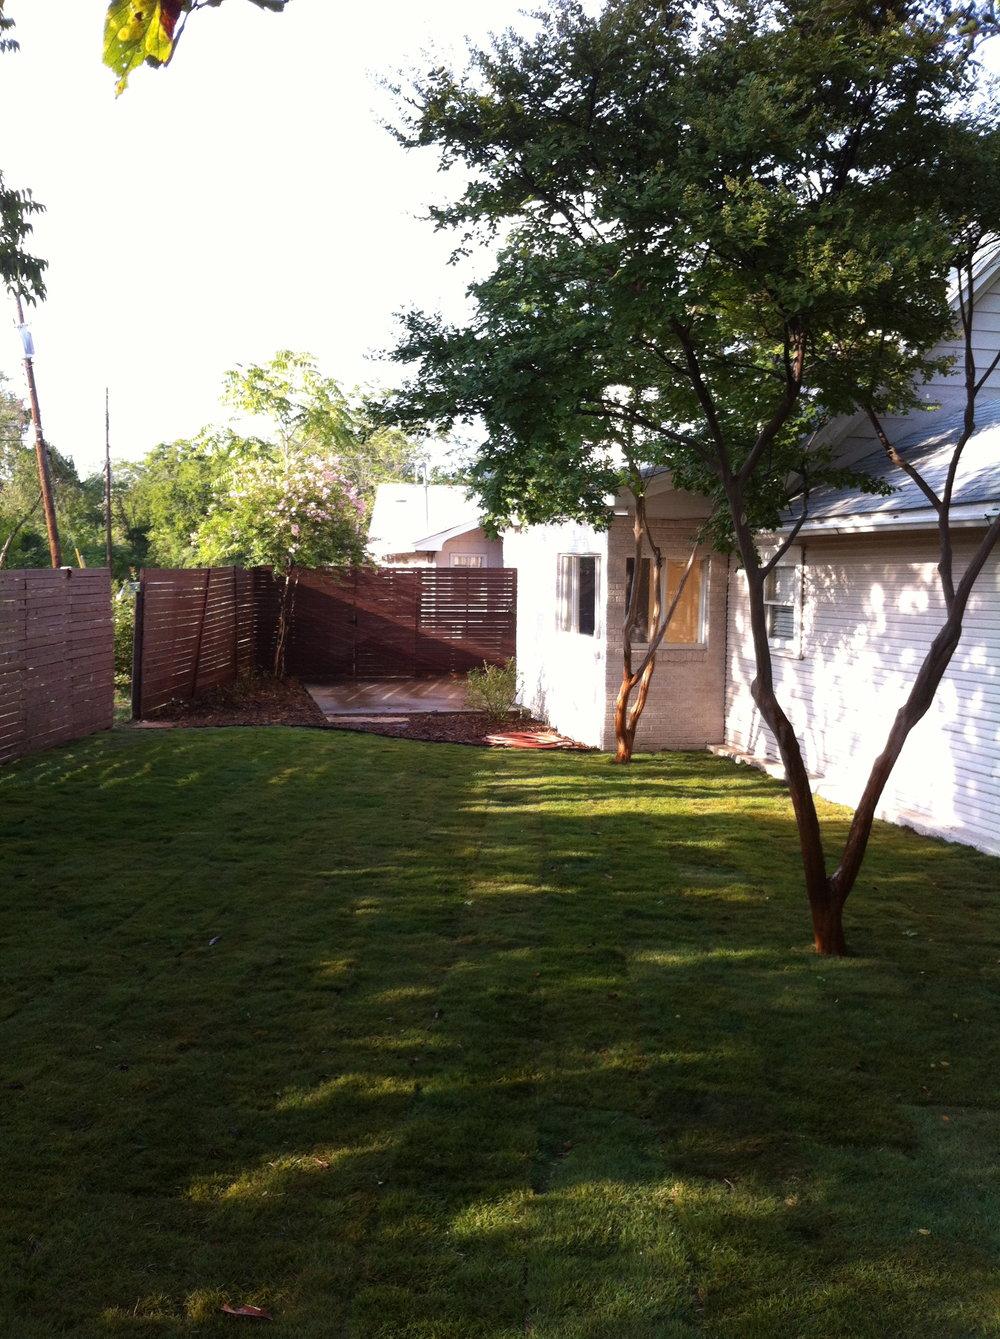 815 back yard2.jpg